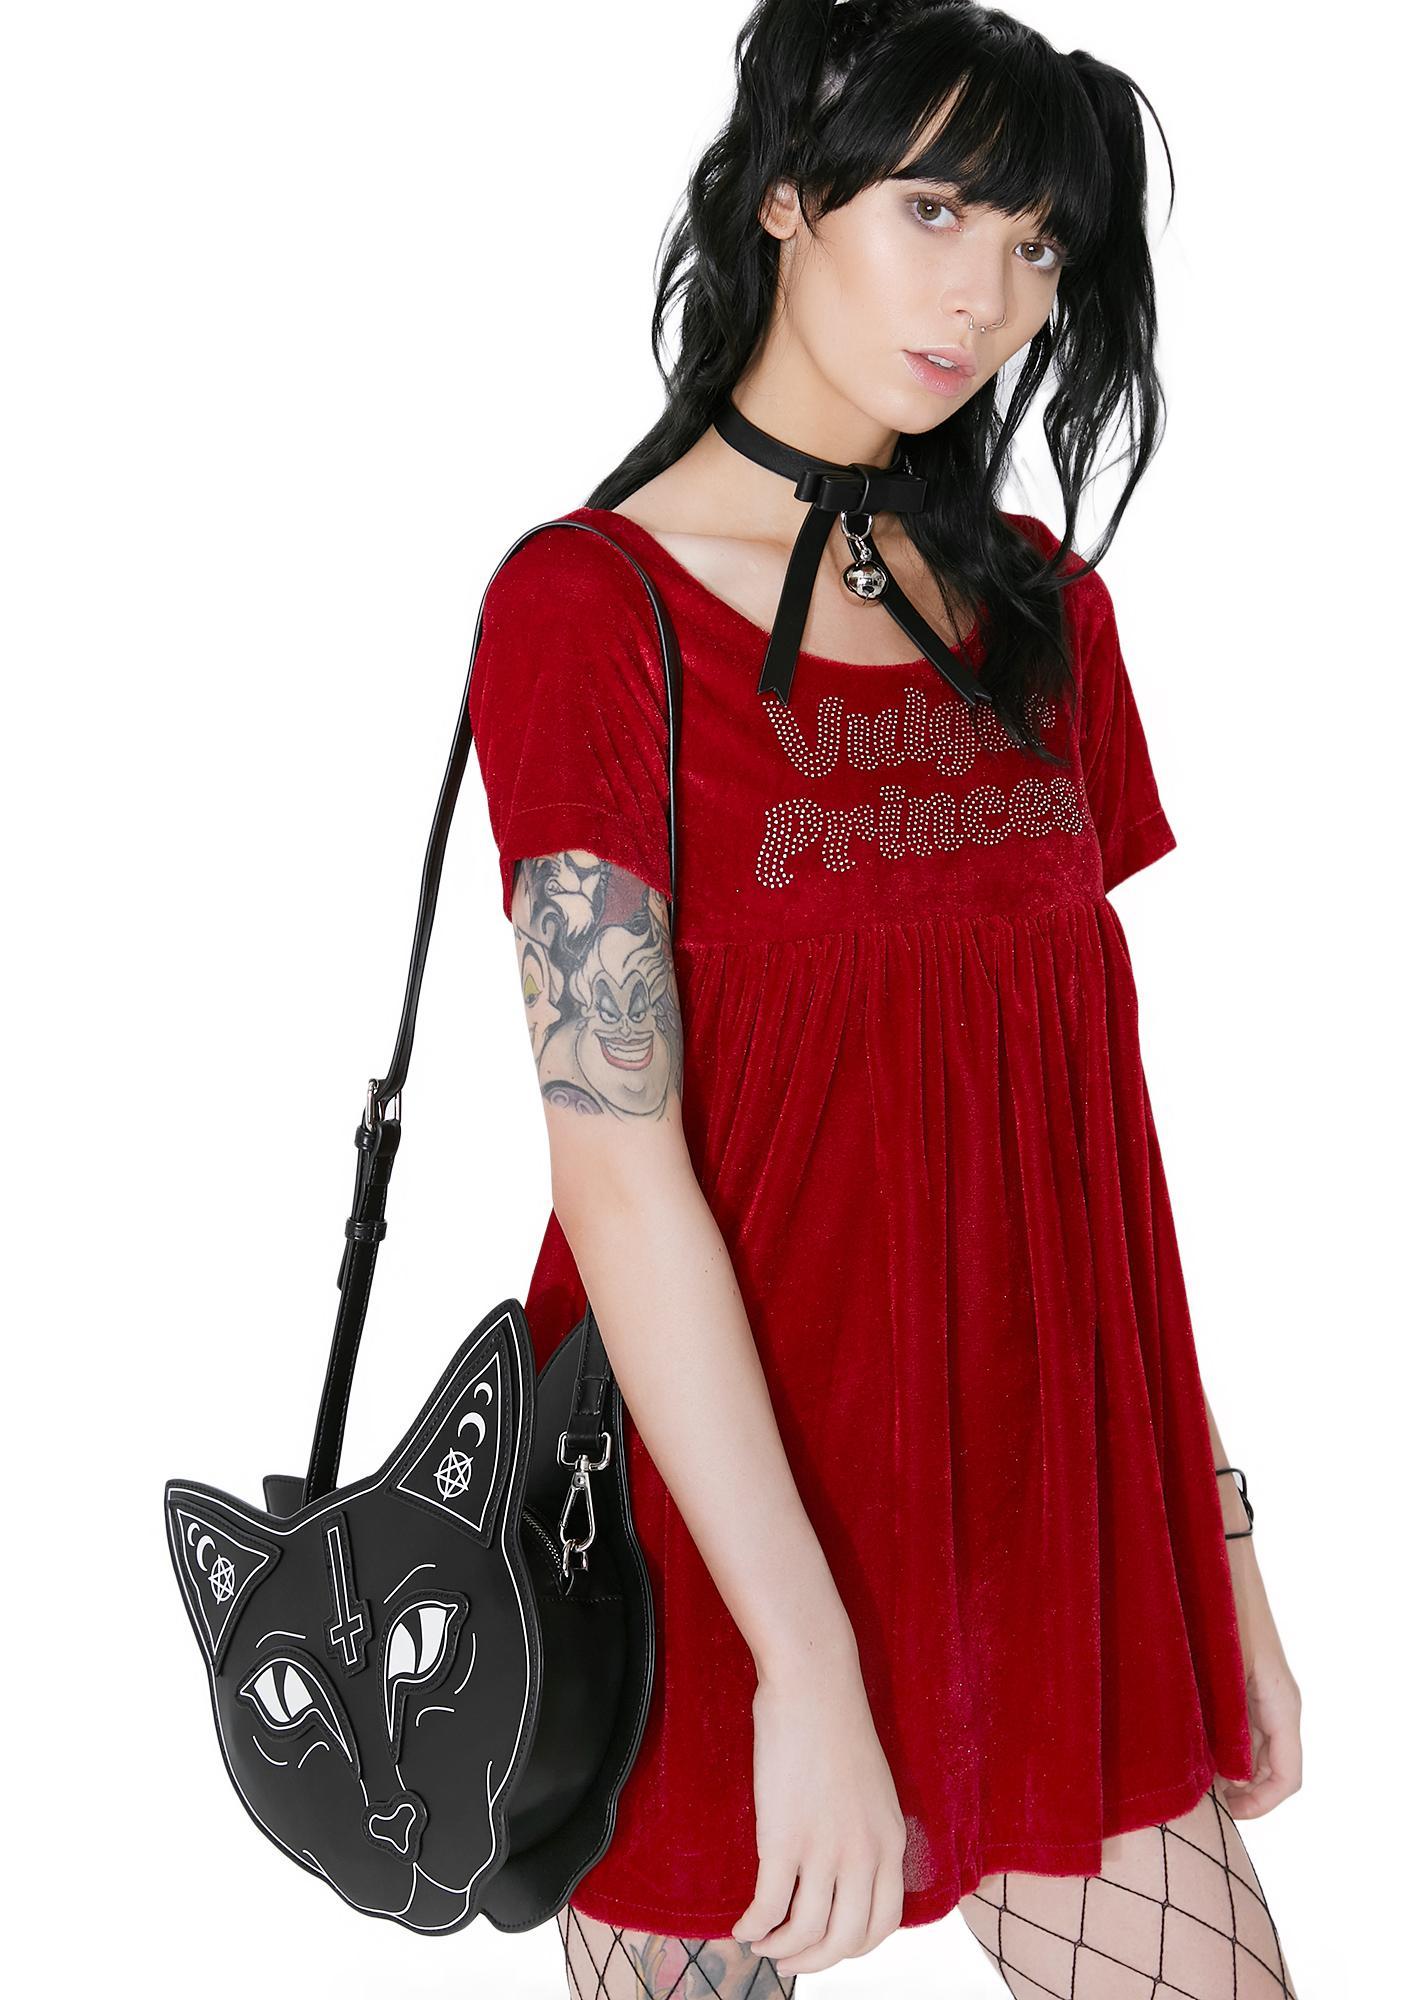 Dresses skirts clothes women disney store - Vulgar Princess Velvet Babydoll Dress